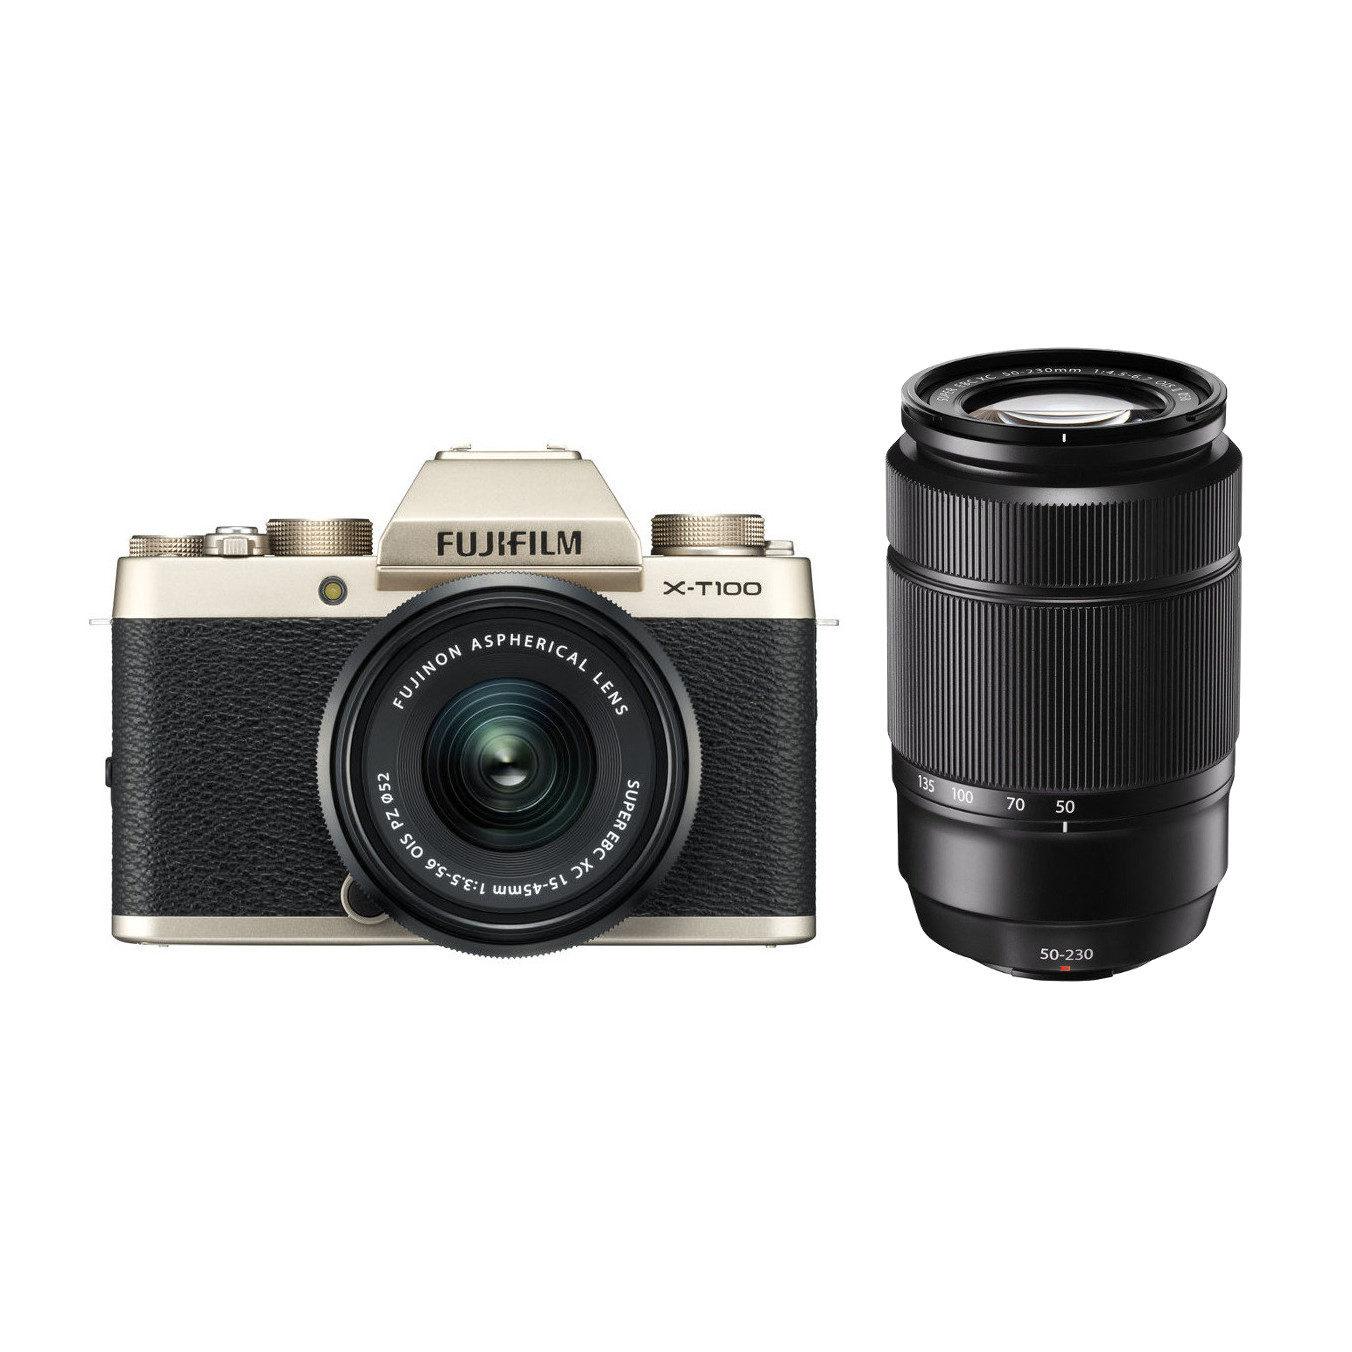 Fujifilm X-T100 + XC 15-45mm + XC 50-230mm Goud [Cameranu.nl]